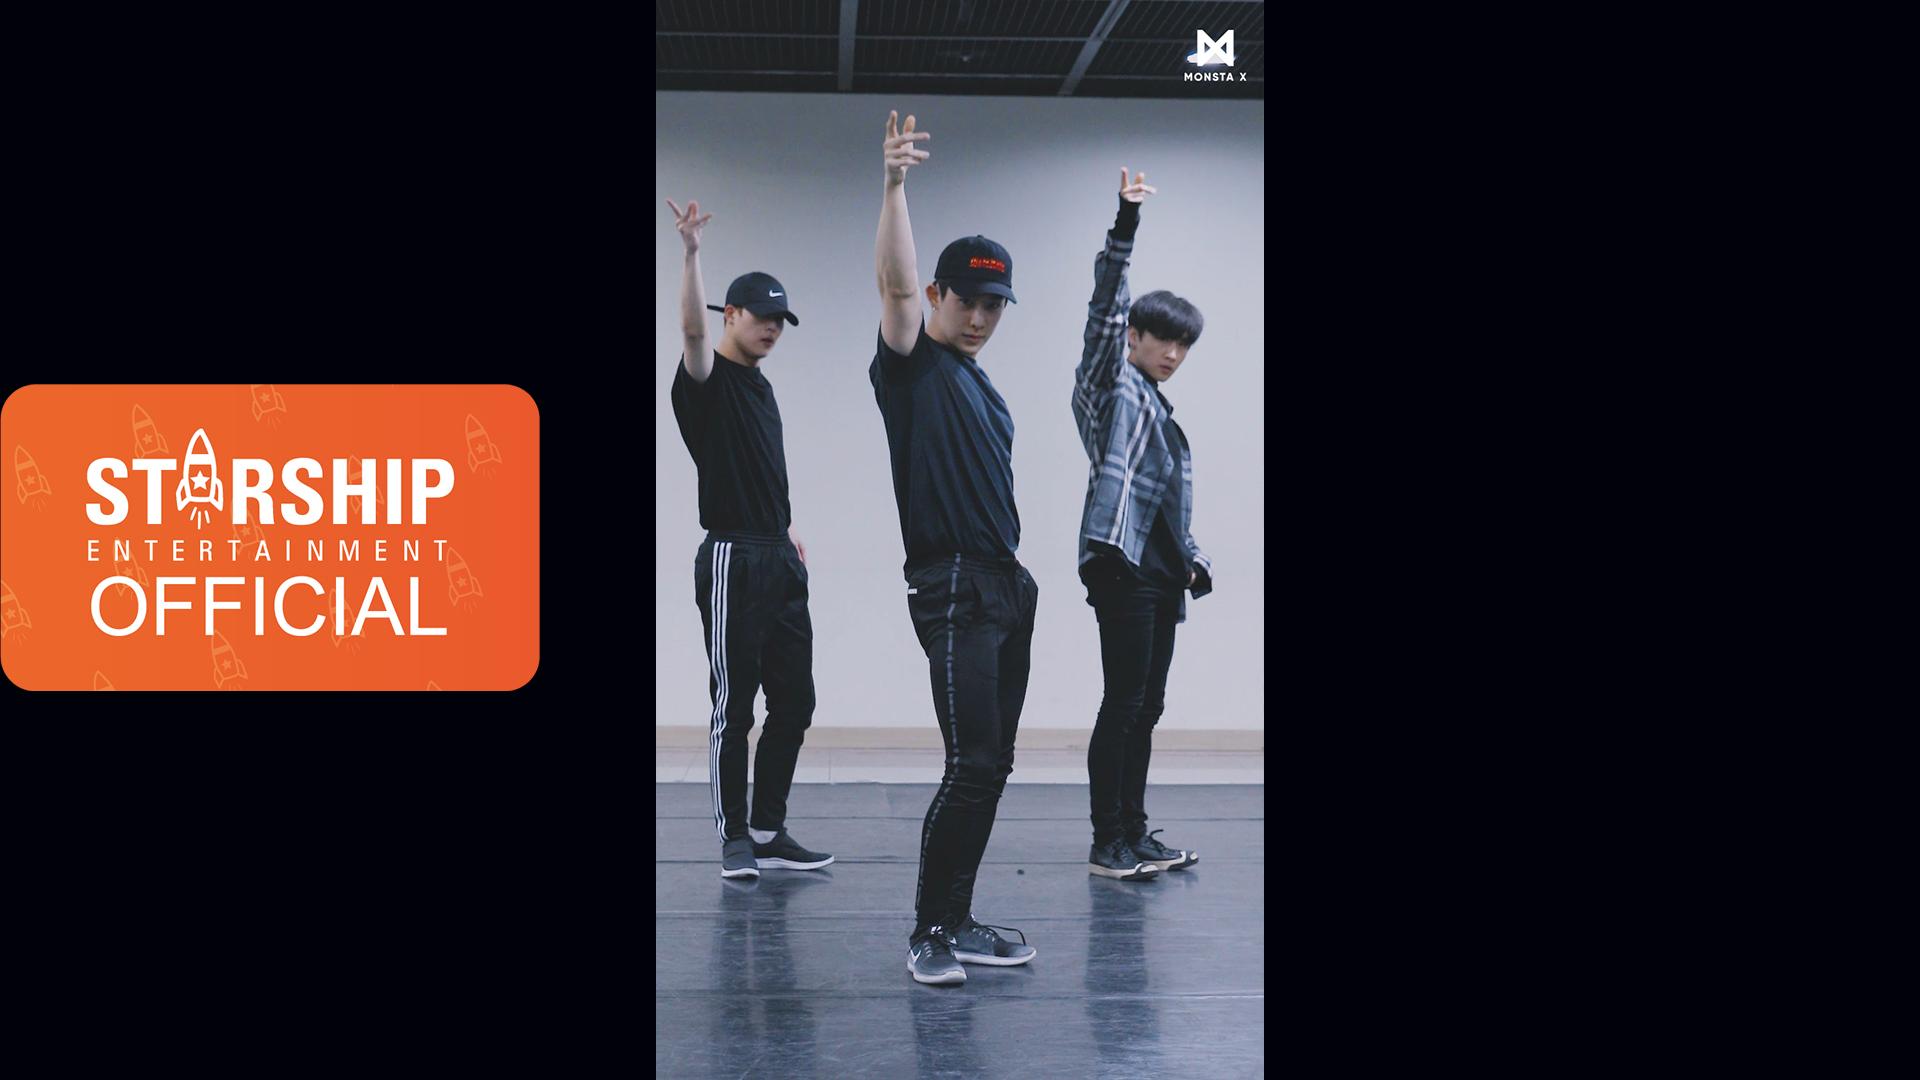 [WONHO][Dance Practice] 몬스타엑스 (MONSTA X) - 'JEALOUSY' Vertical Video